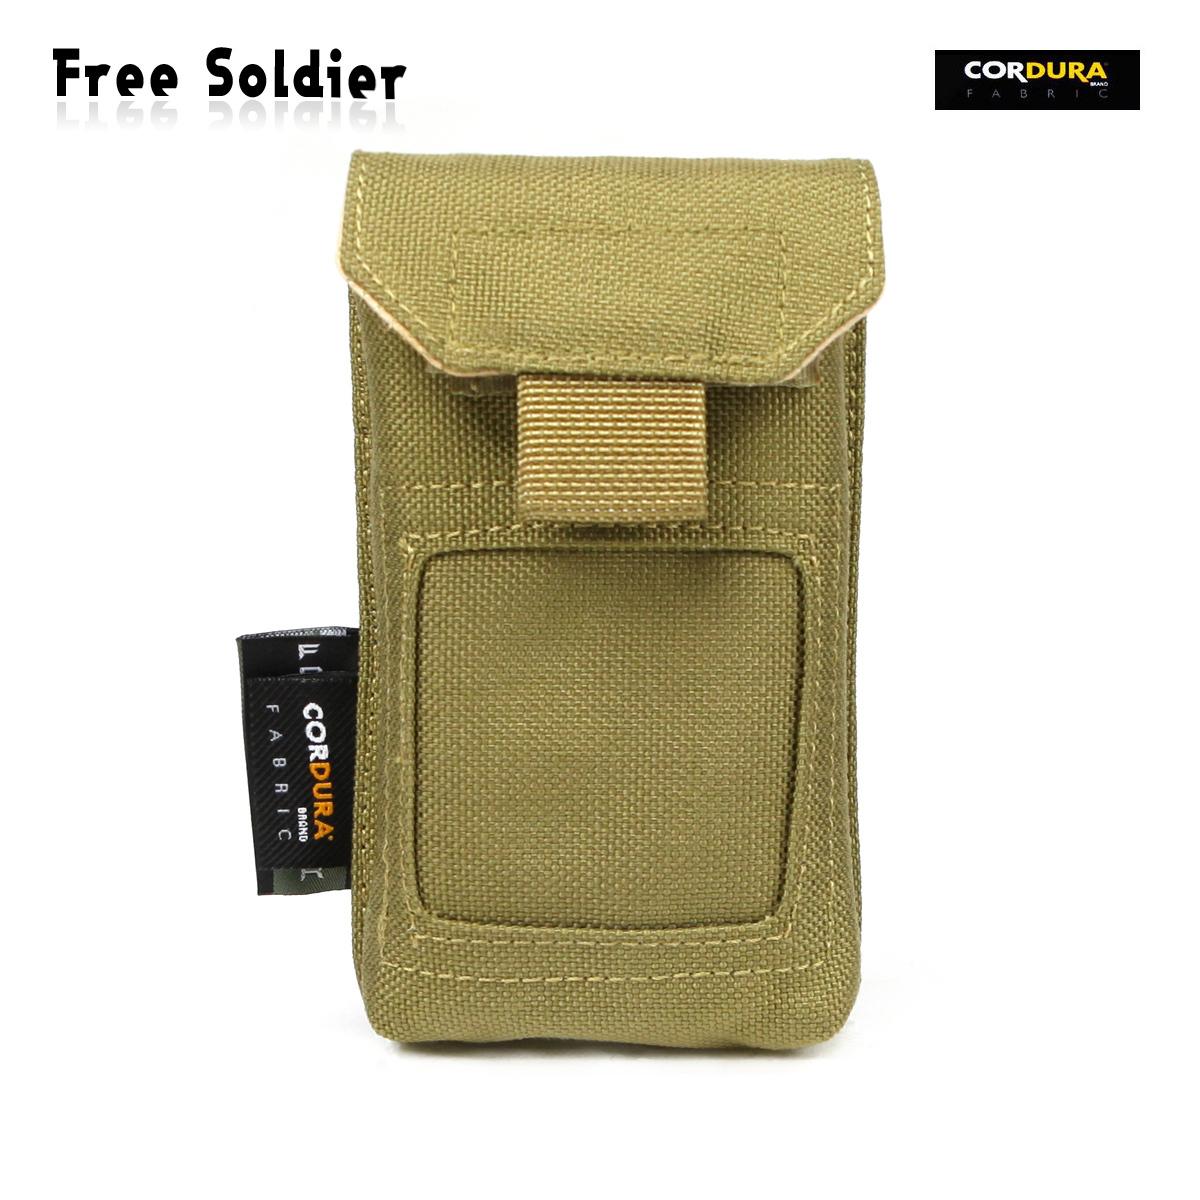 Сумка с ремнем Free Soldier FS/071 EDC Free Soldier / free soldiers